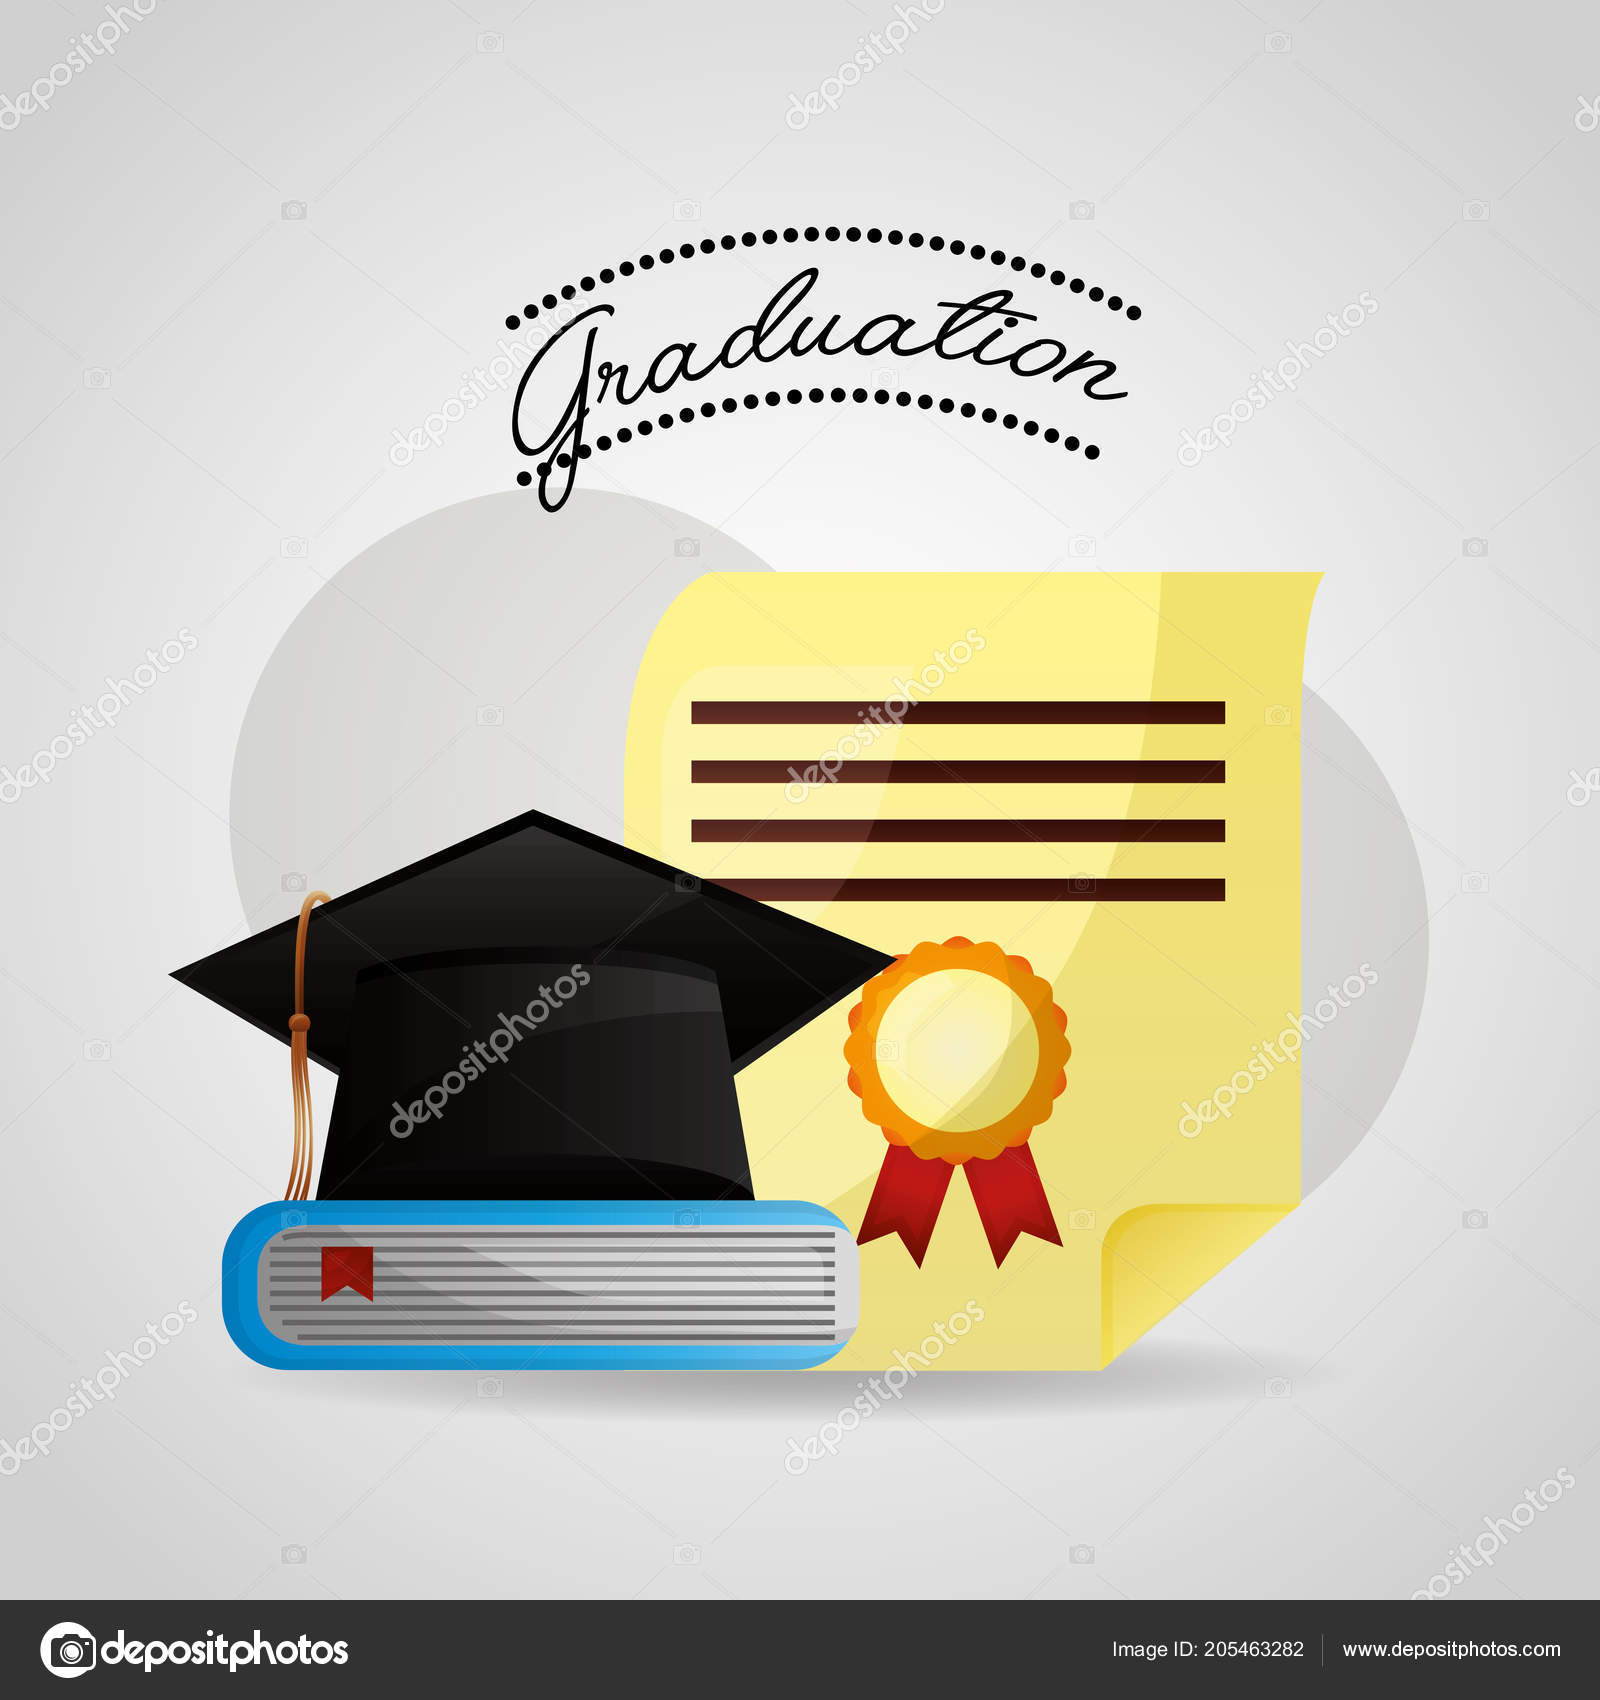 Congratulations Graduation Card Stock Vector C Yupiramos 205463282